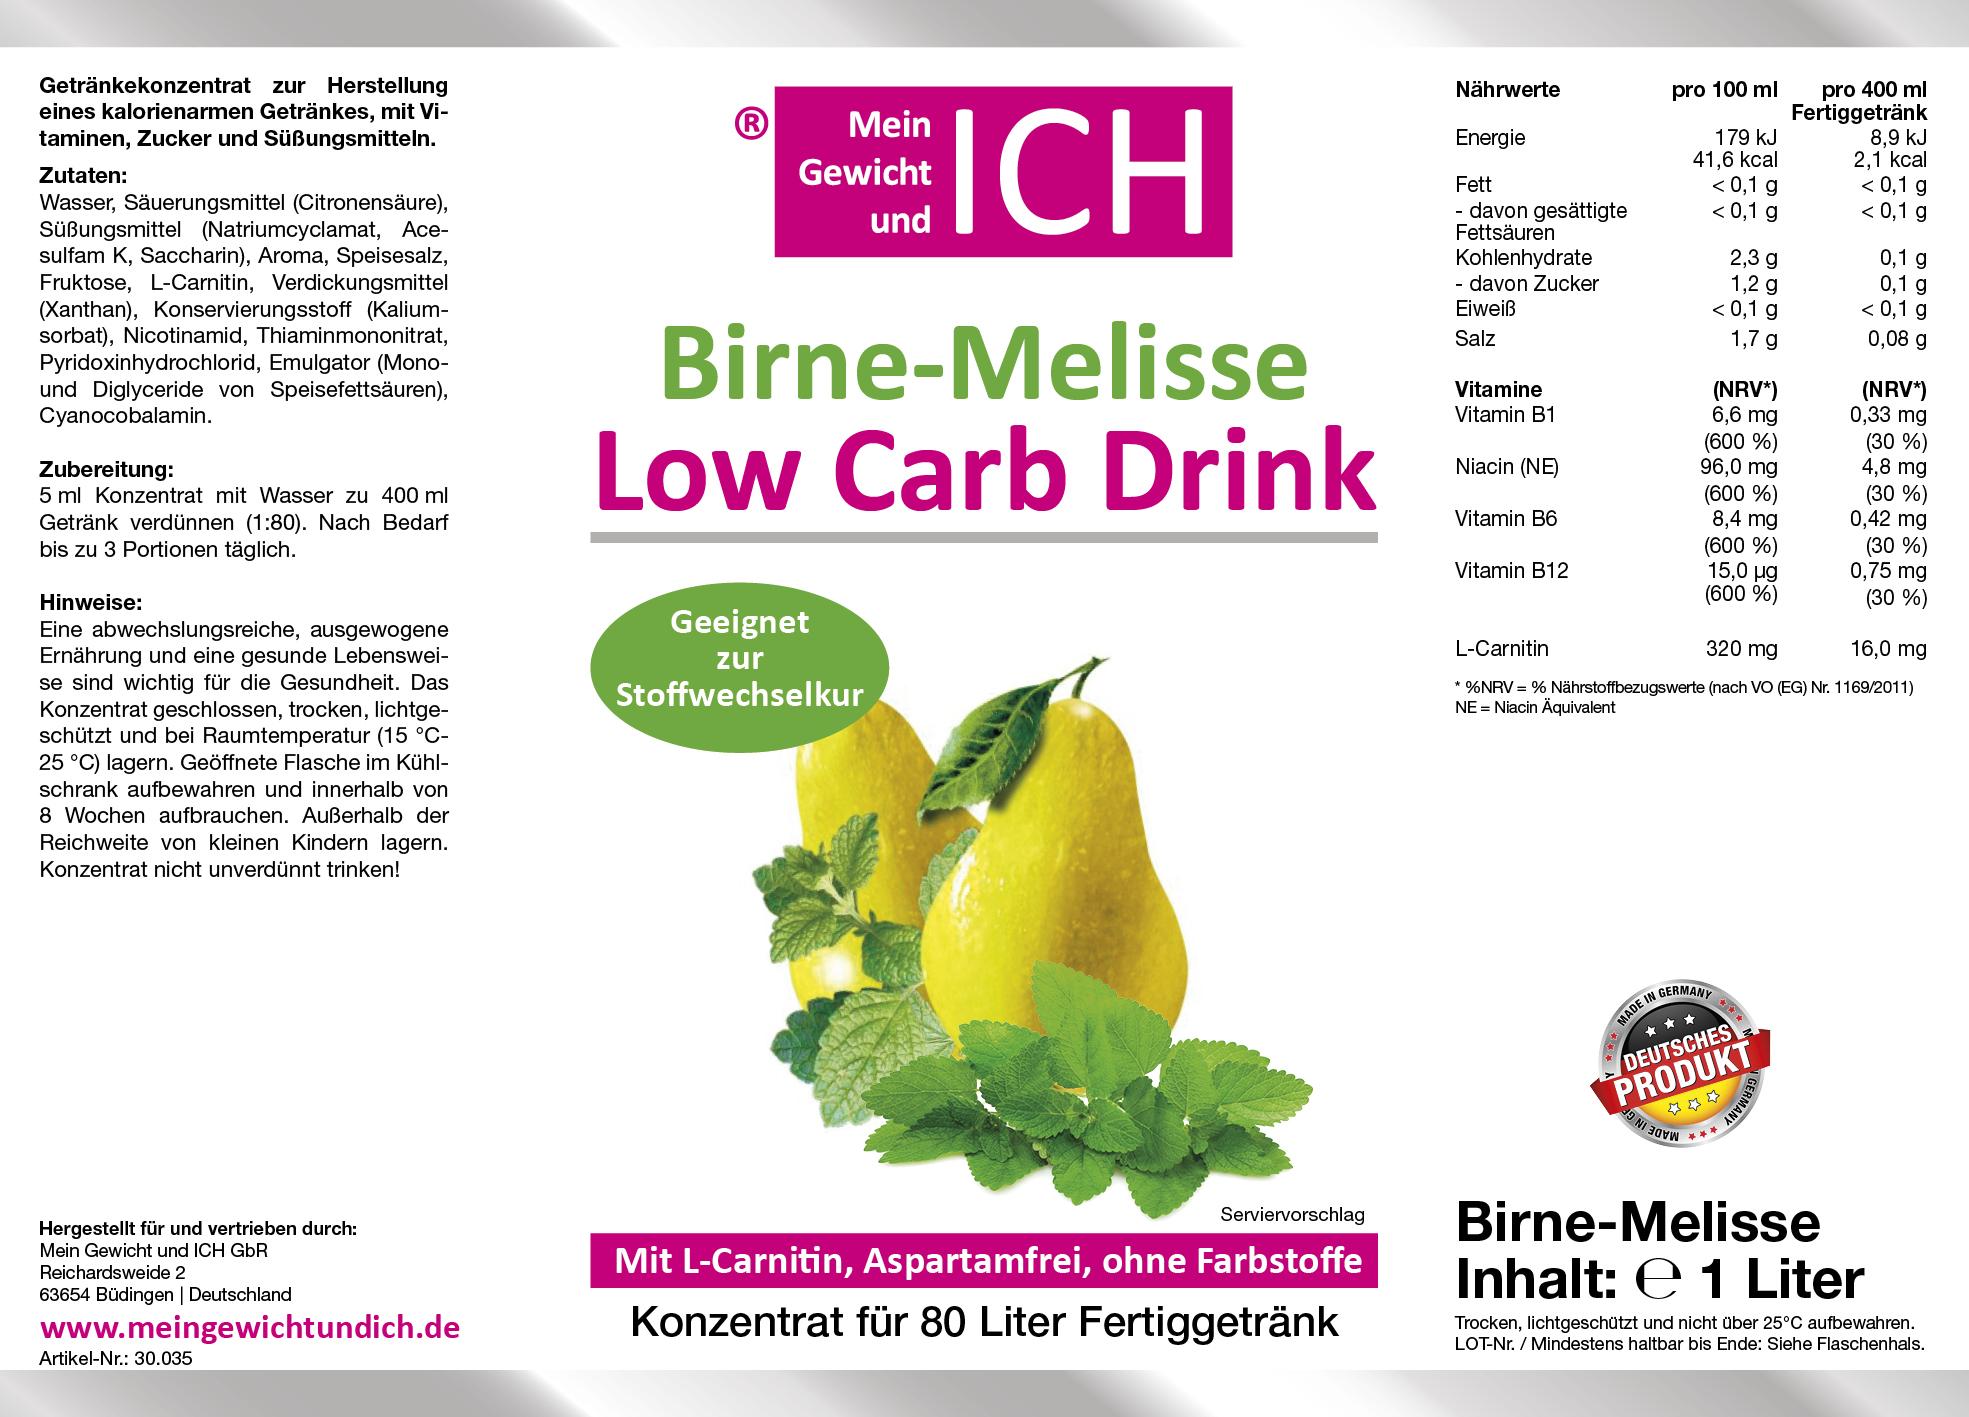 Low carb joghurt kaufen